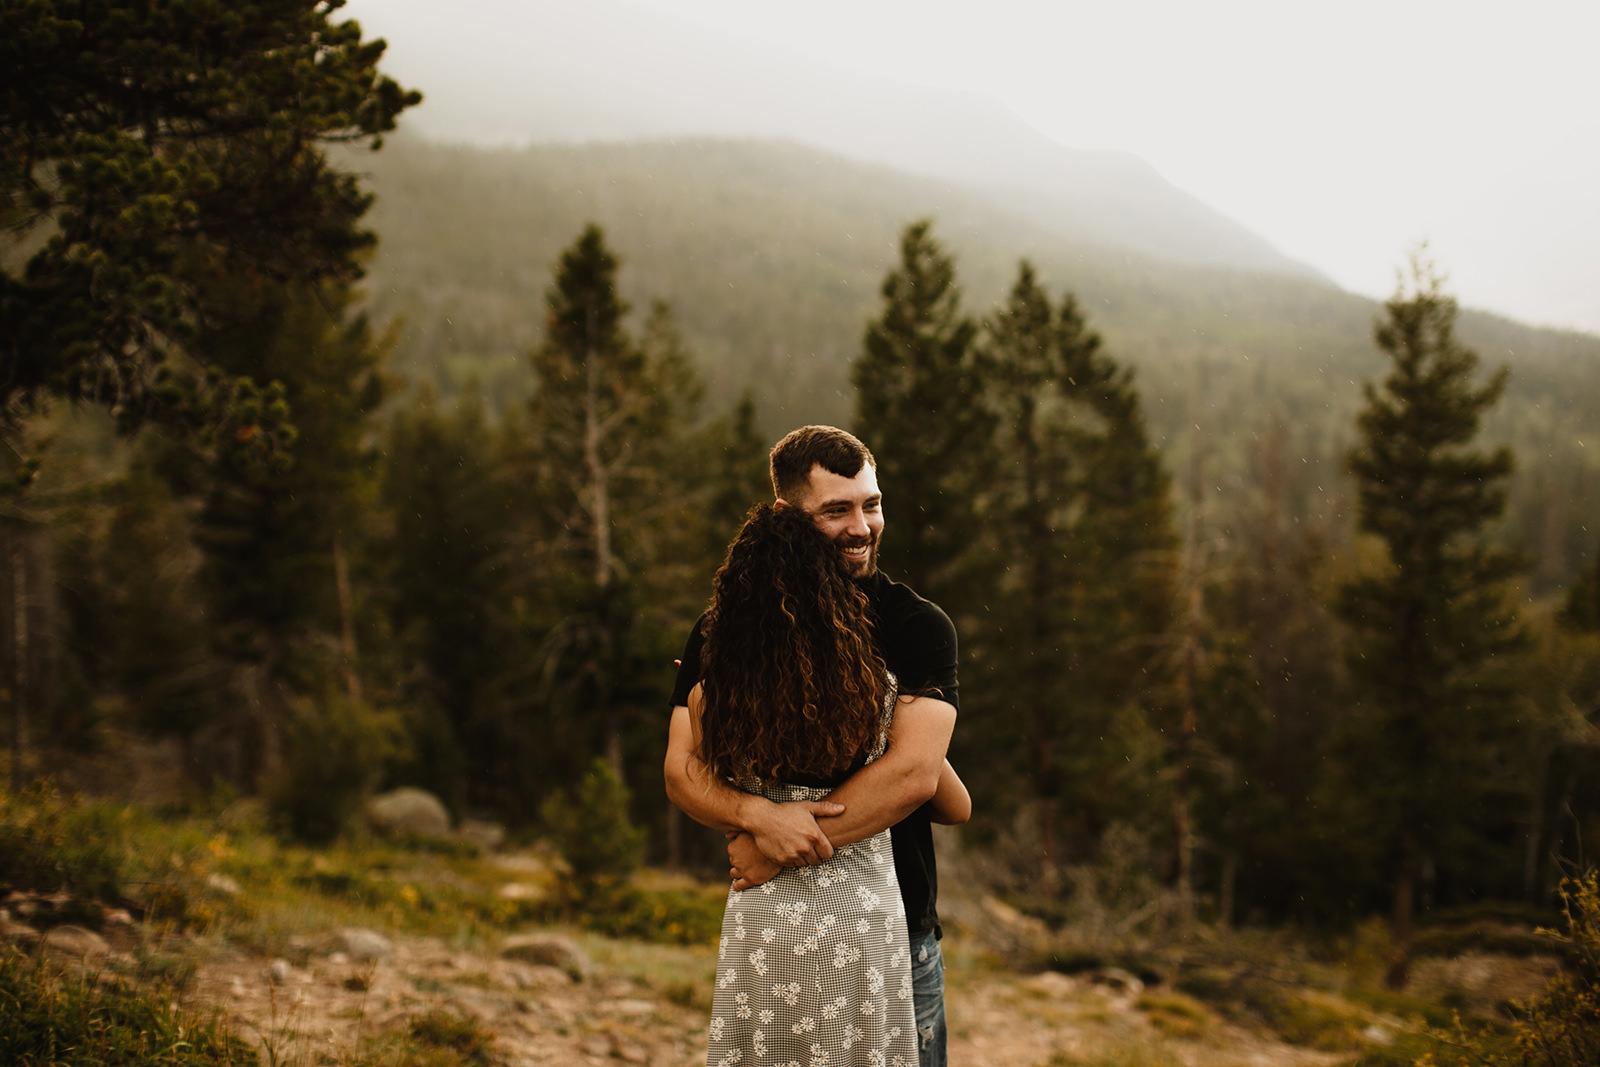 Liz Osban Photography Cheyenne Wyoming Engagement Wedding Photographer couple adventure elopement wedding laramie denver fort collins colorado rocky mountain national park13.jpg